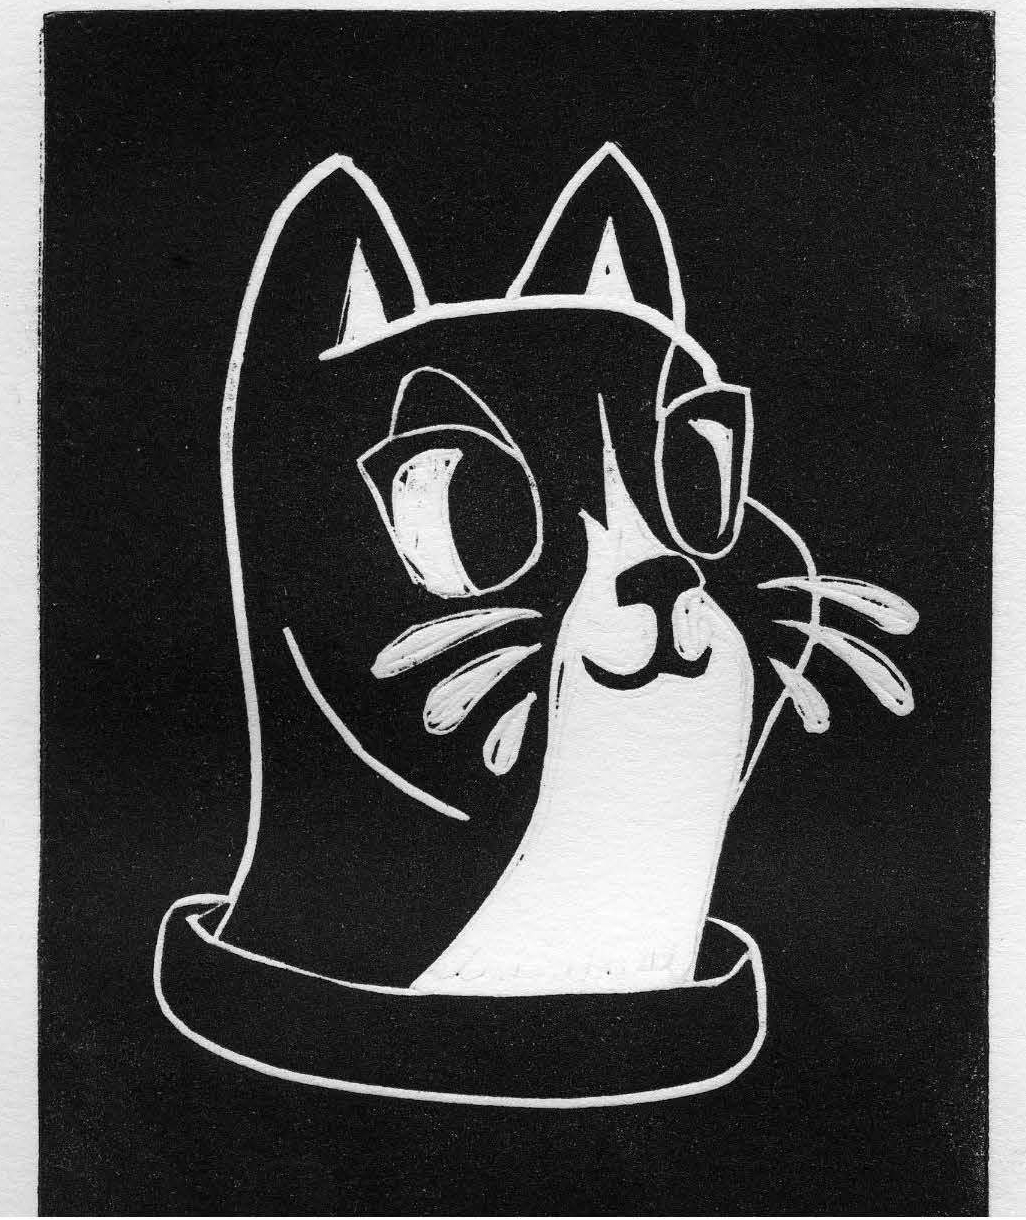 aruba-the-cat-linocut-print.jpg